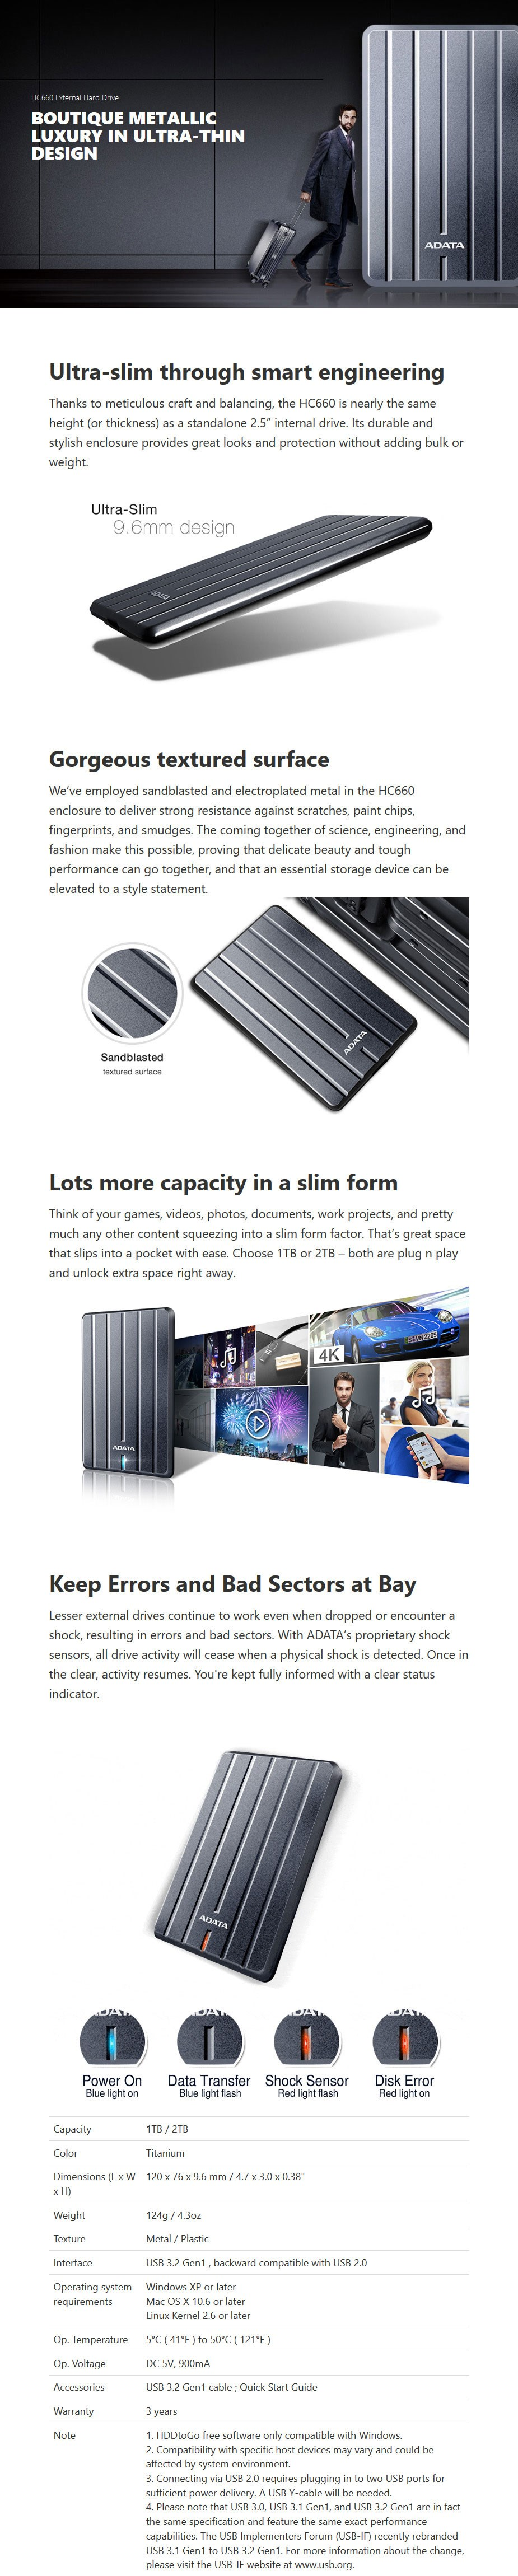 adata-hc660-2tb-slim-25-usb-30-portable-external-hard-drive-titanium-ac32185-4.jpg